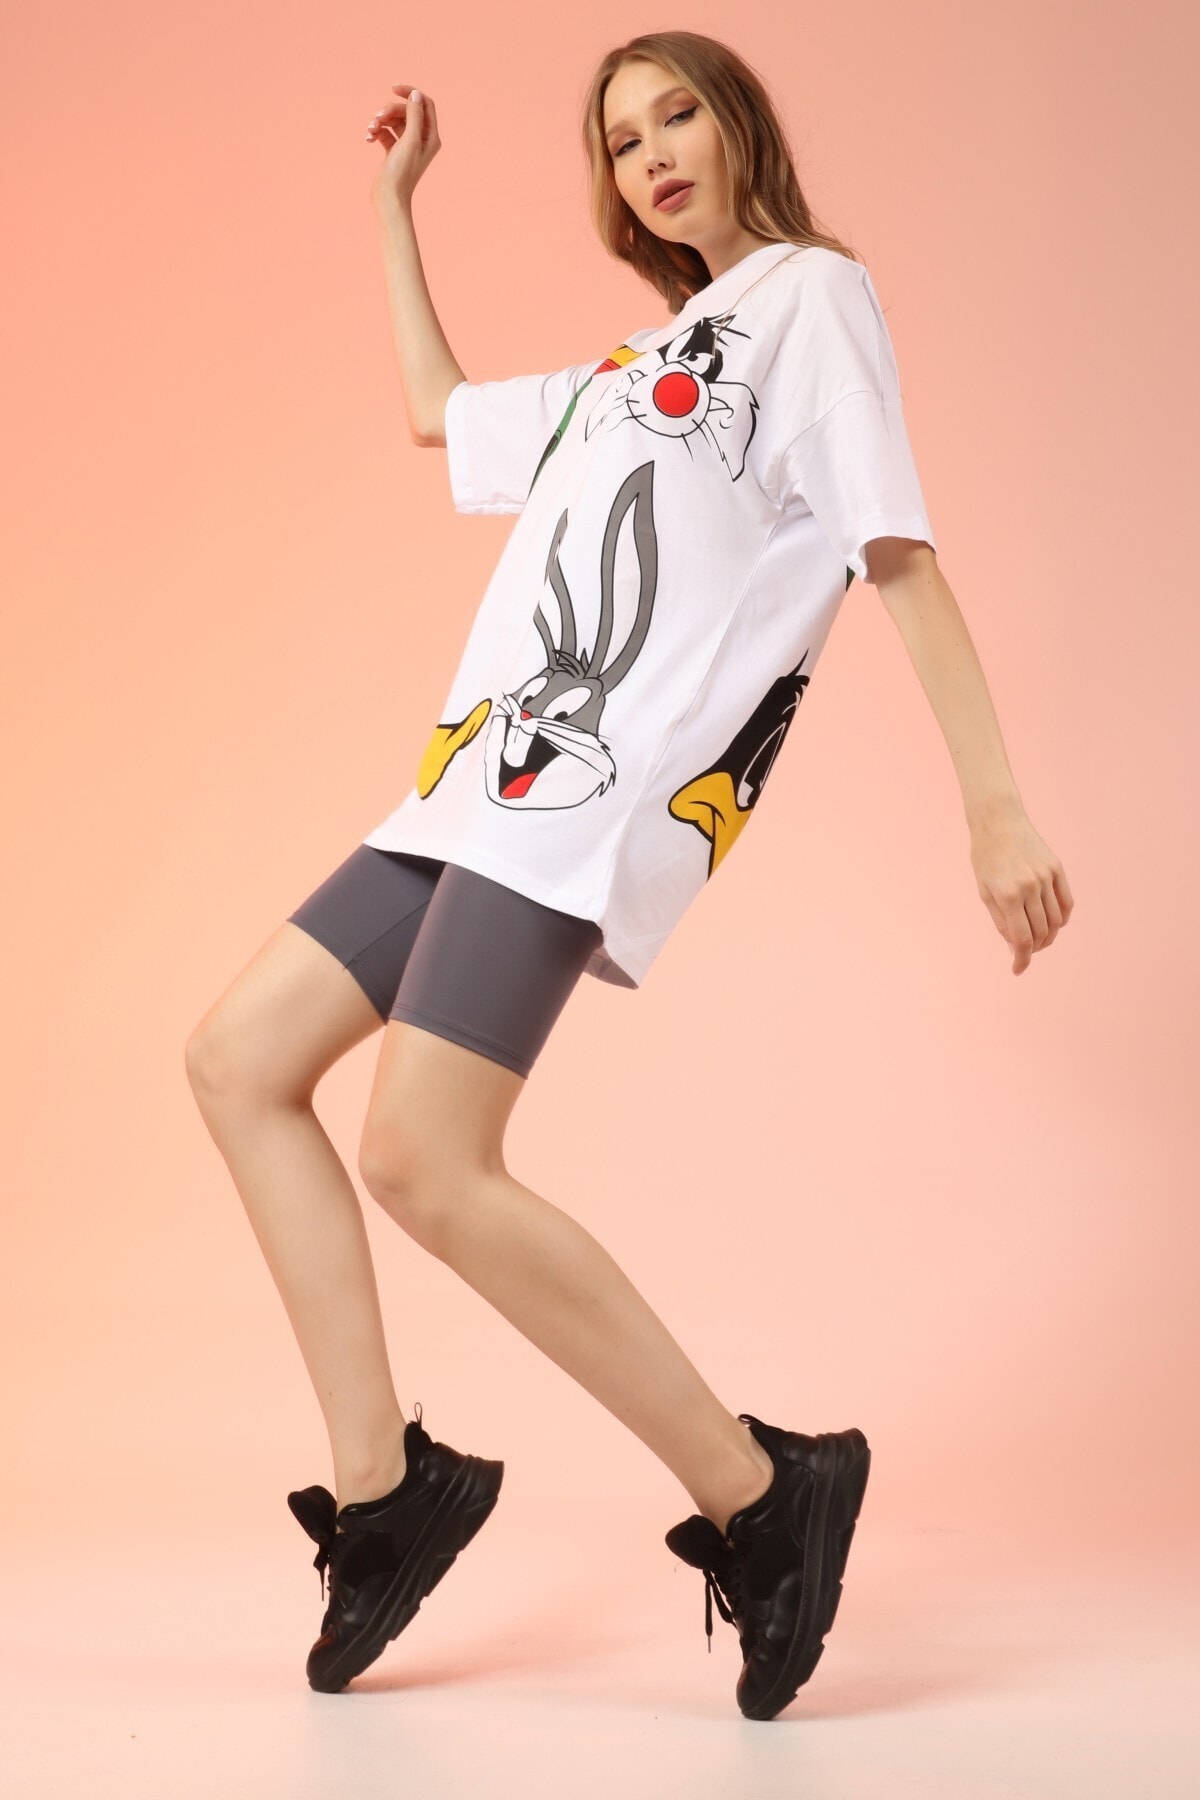 Rocqerx Unisex Beyaz Bugs Bunny Baskılı Tshirt 2